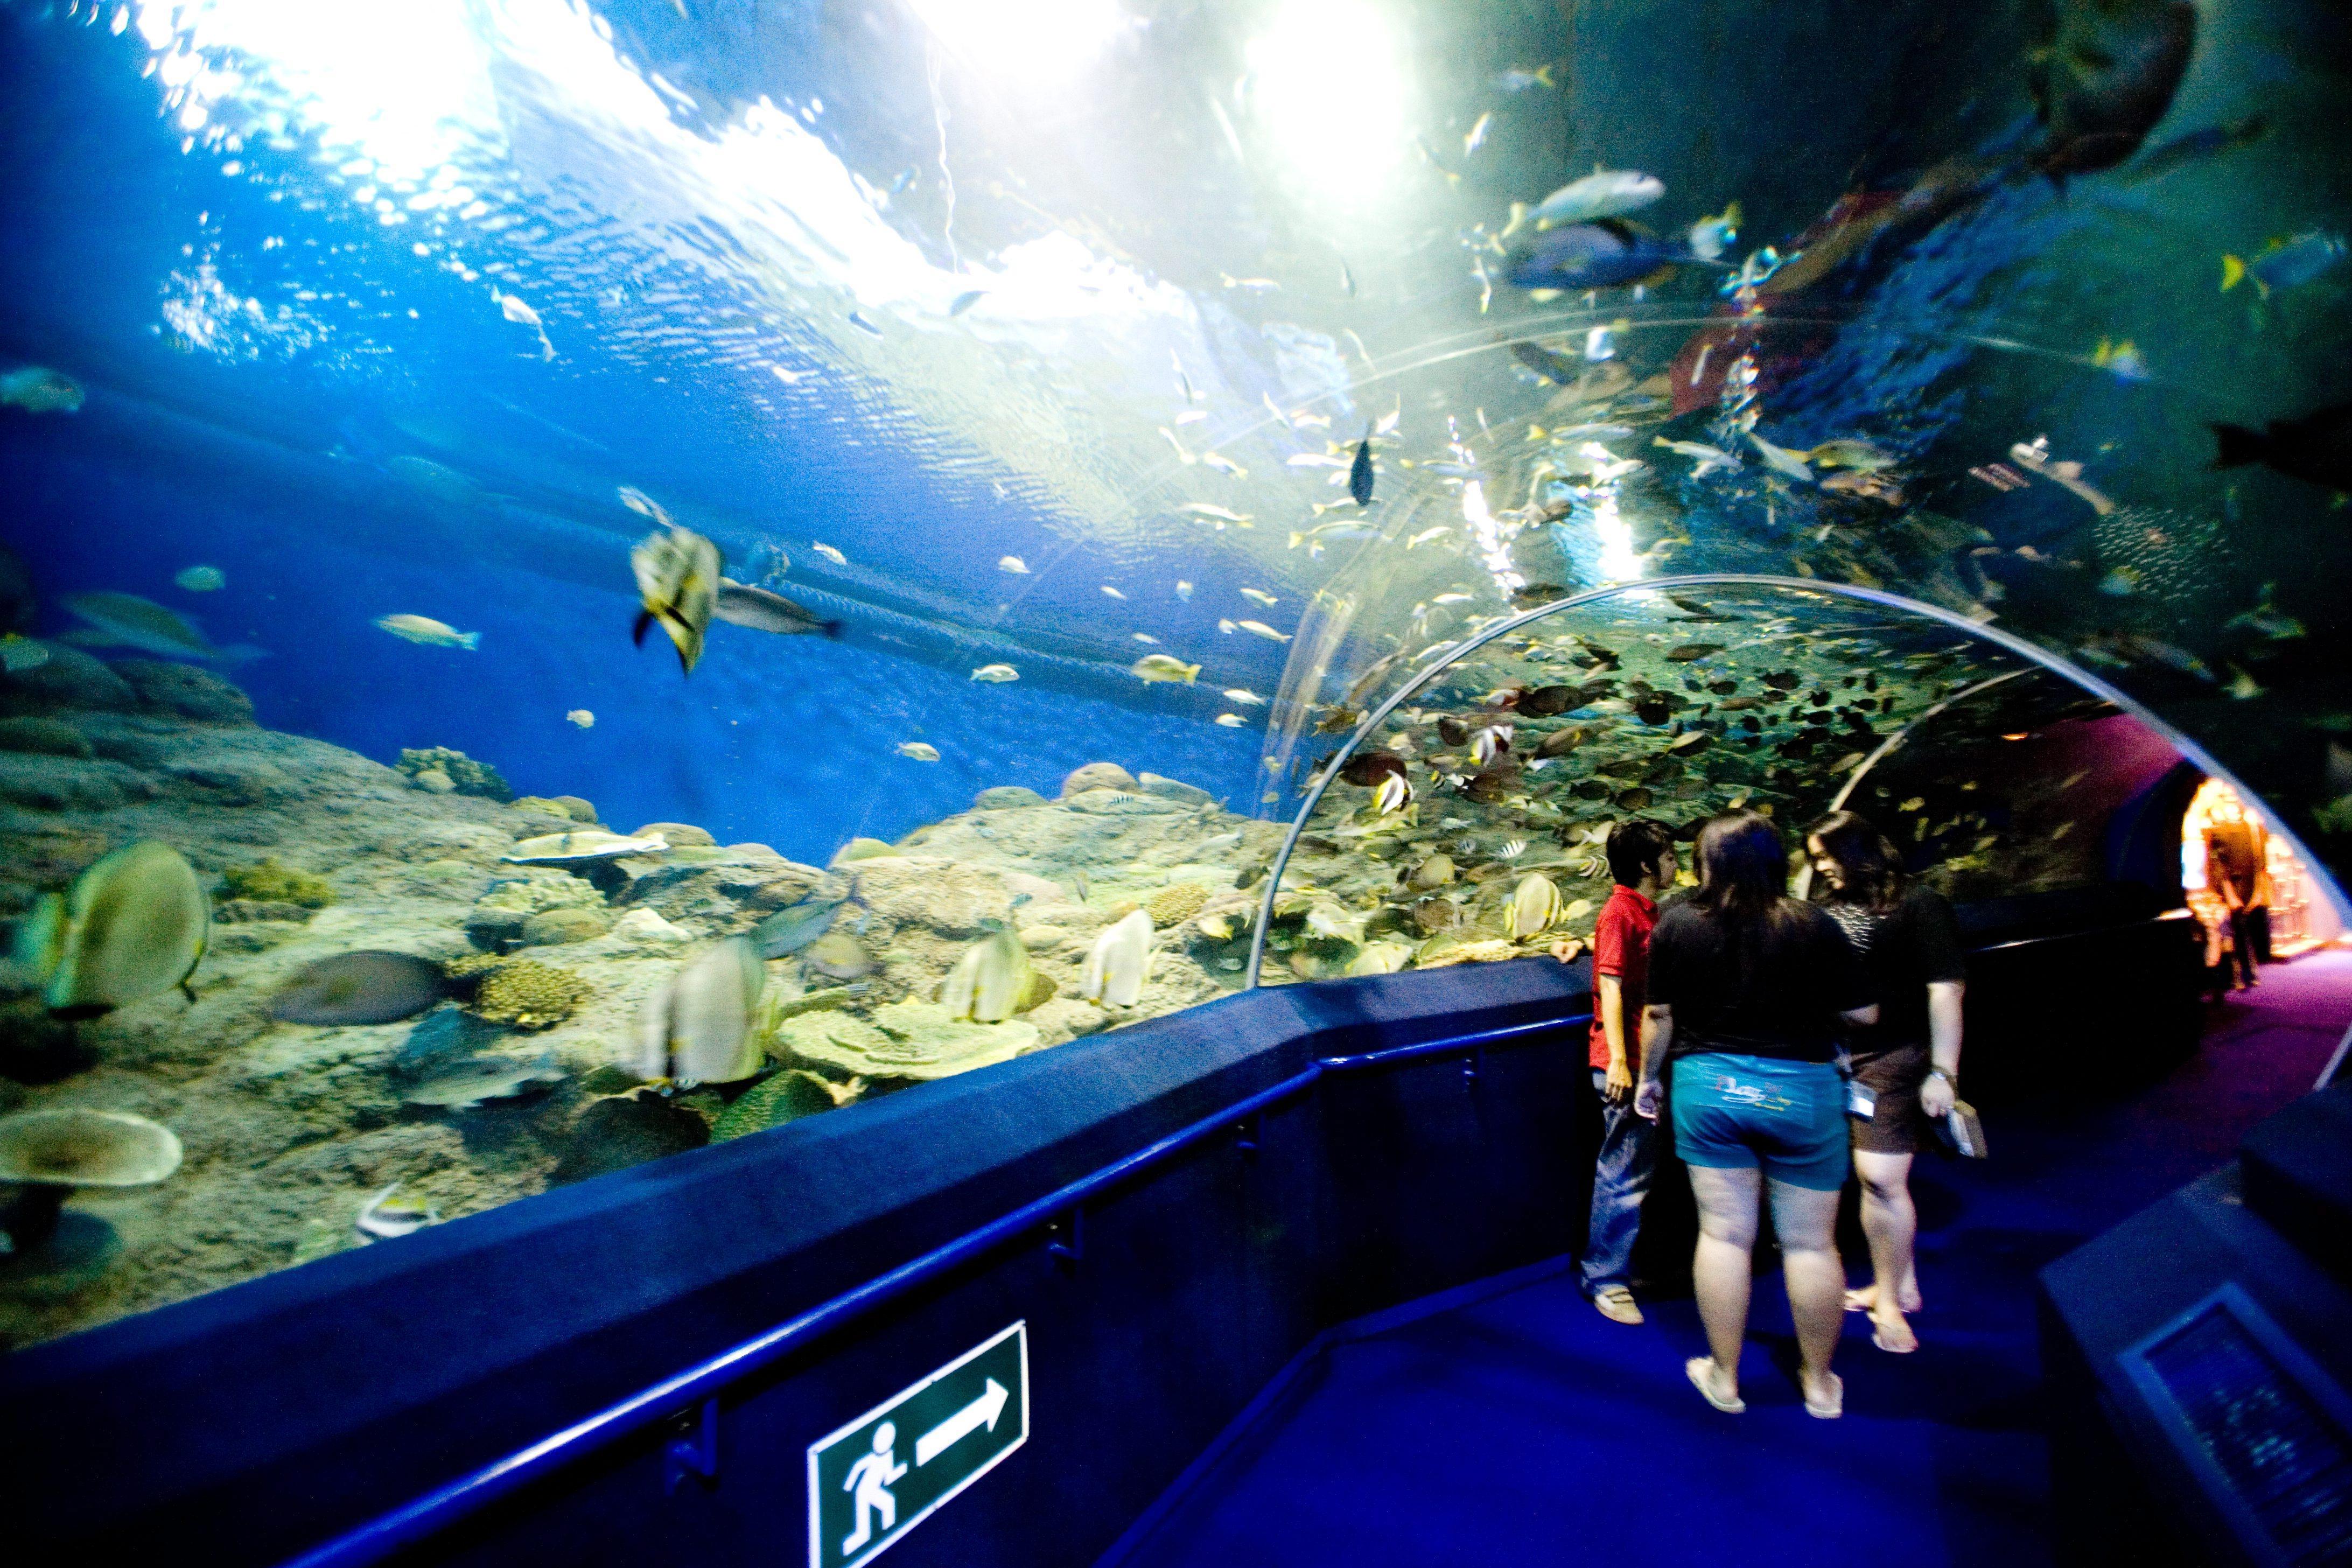 Underwater World Pattaya at Chong Buri *** Local Caption *** อันเดอร์วอเตอร์ เวิล์ด พัทยา จังหวัดชลบุรี